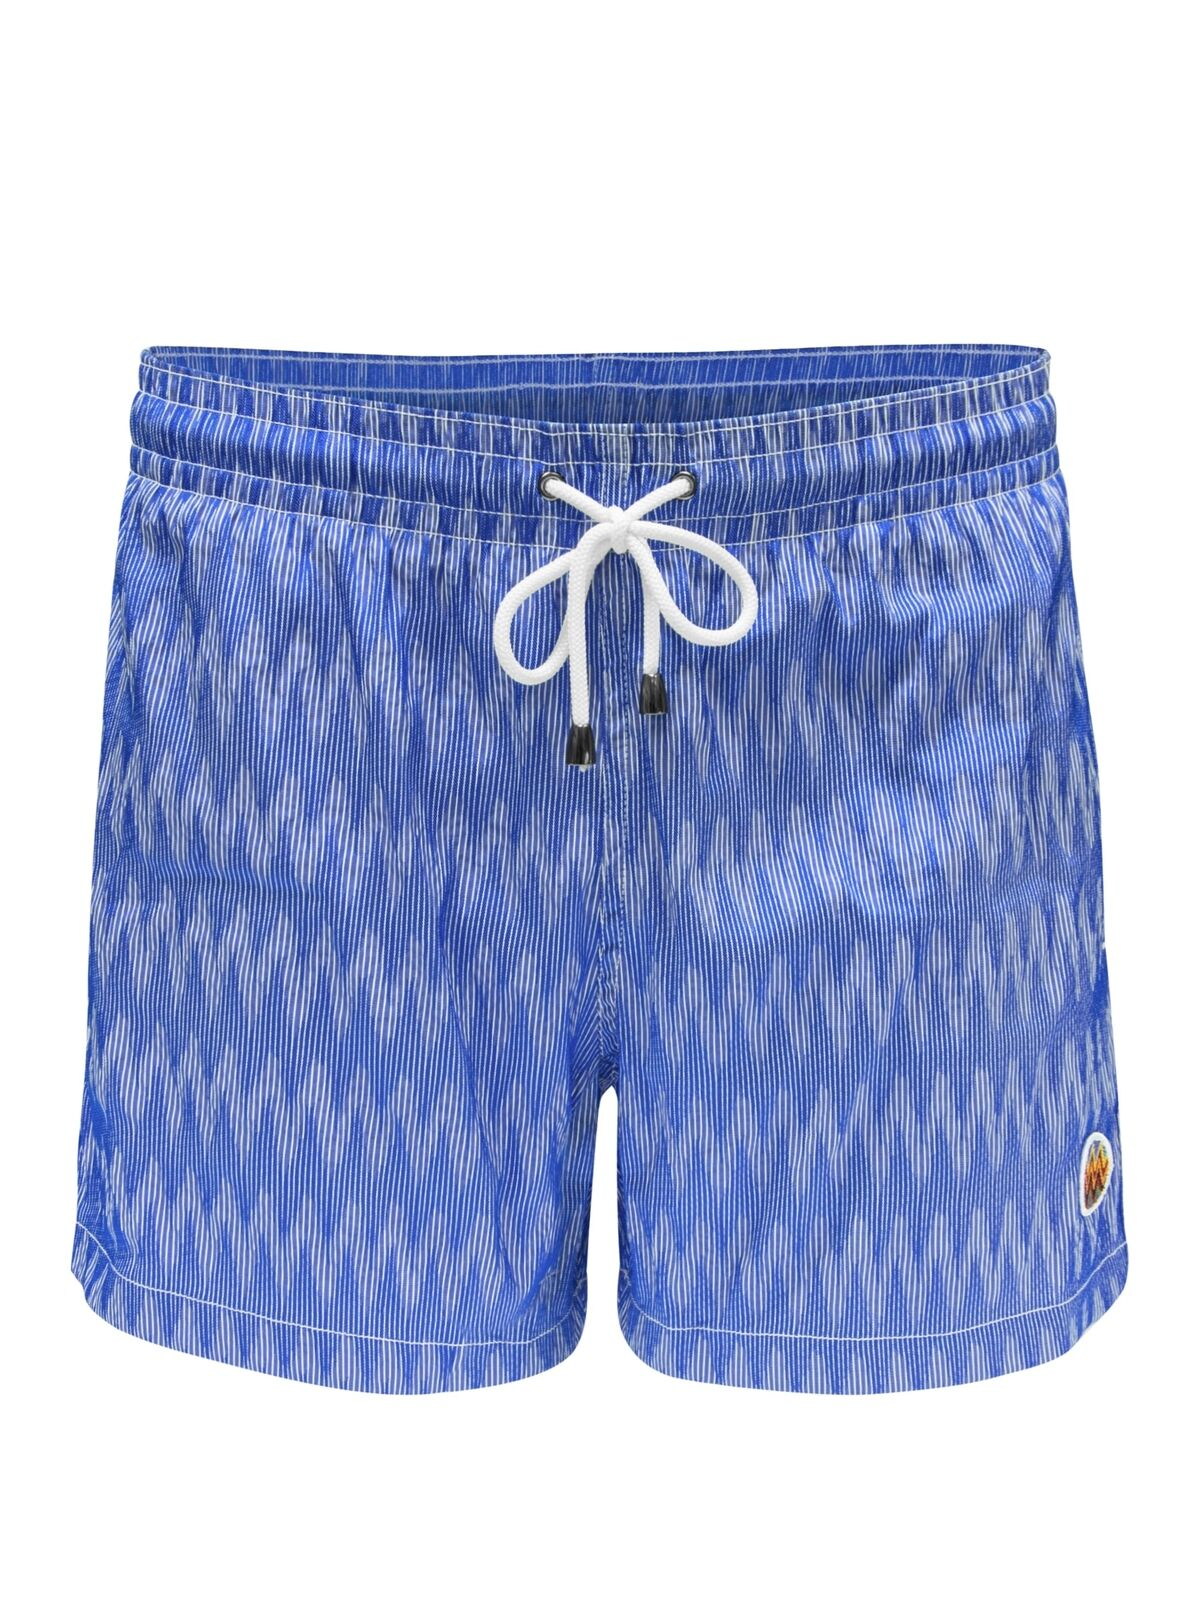 MISSONI Mare Space-Dye greenical Stripe Shorts